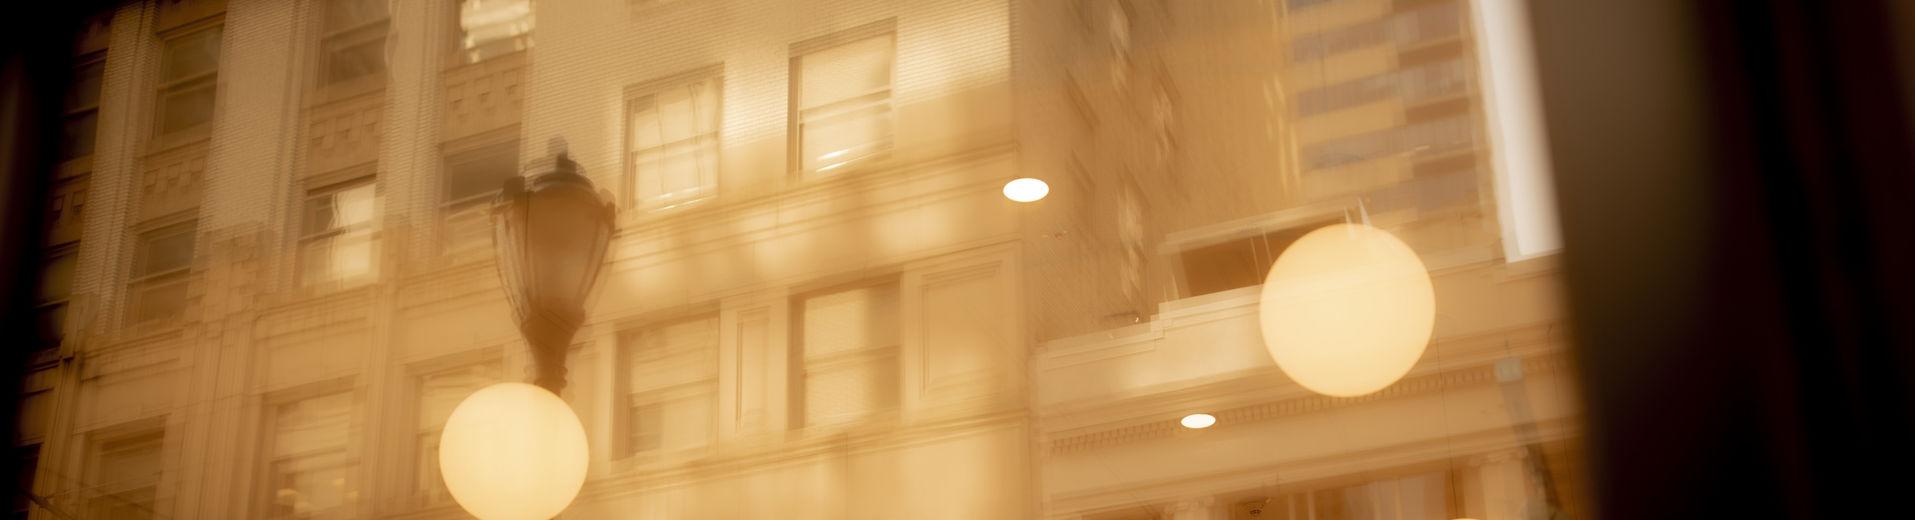 abstract image of downtown Philadelphia.